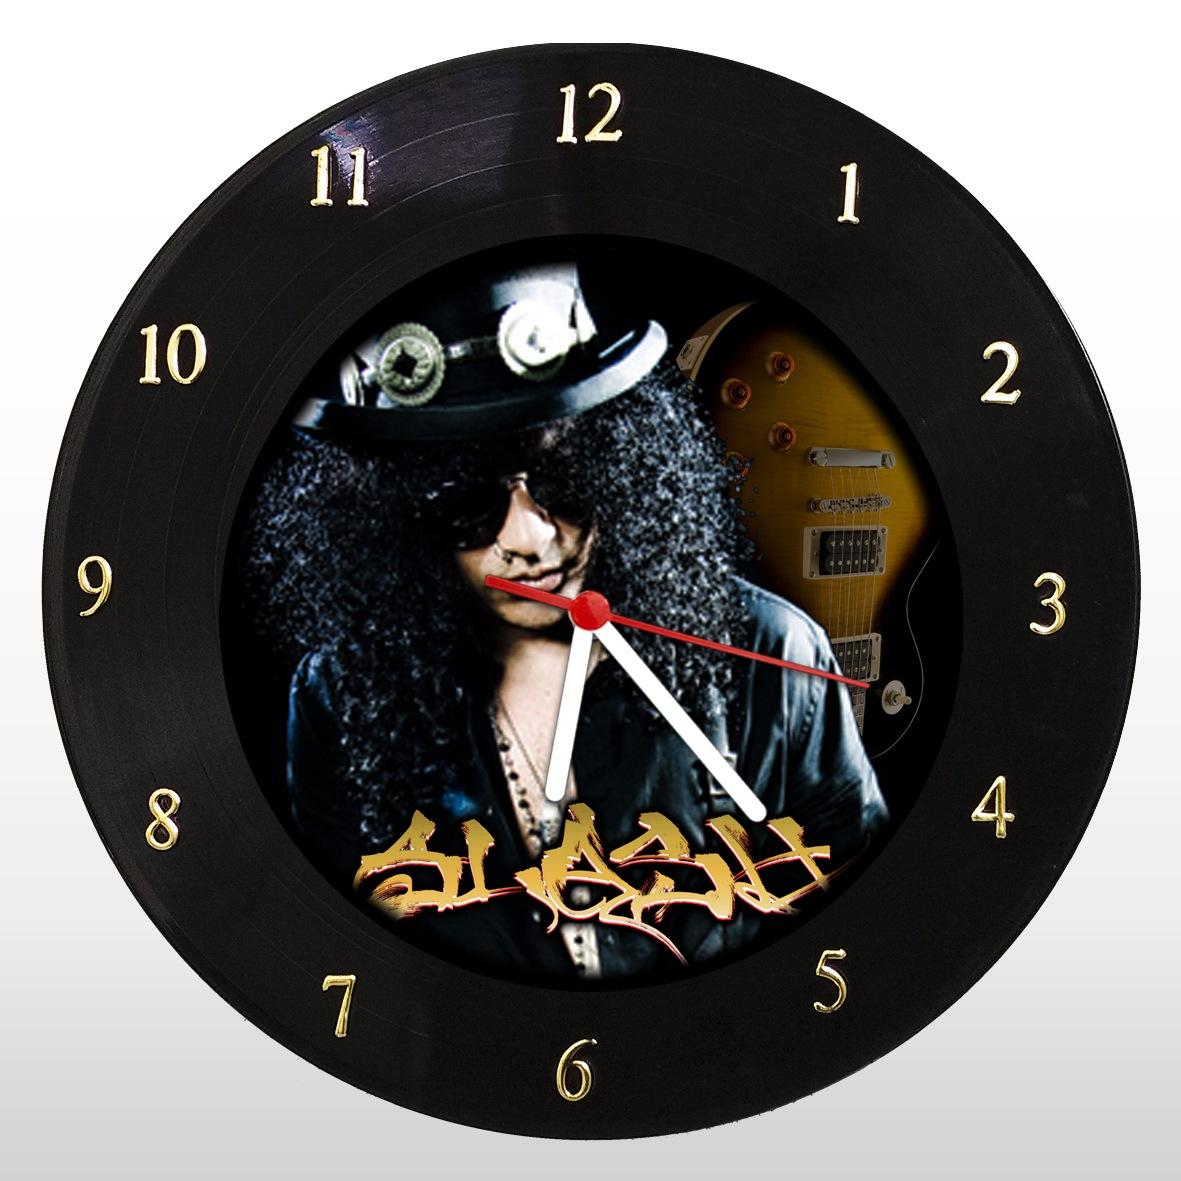 Relógio de Parede em Disco de Vinil Slash - Mr. Rock